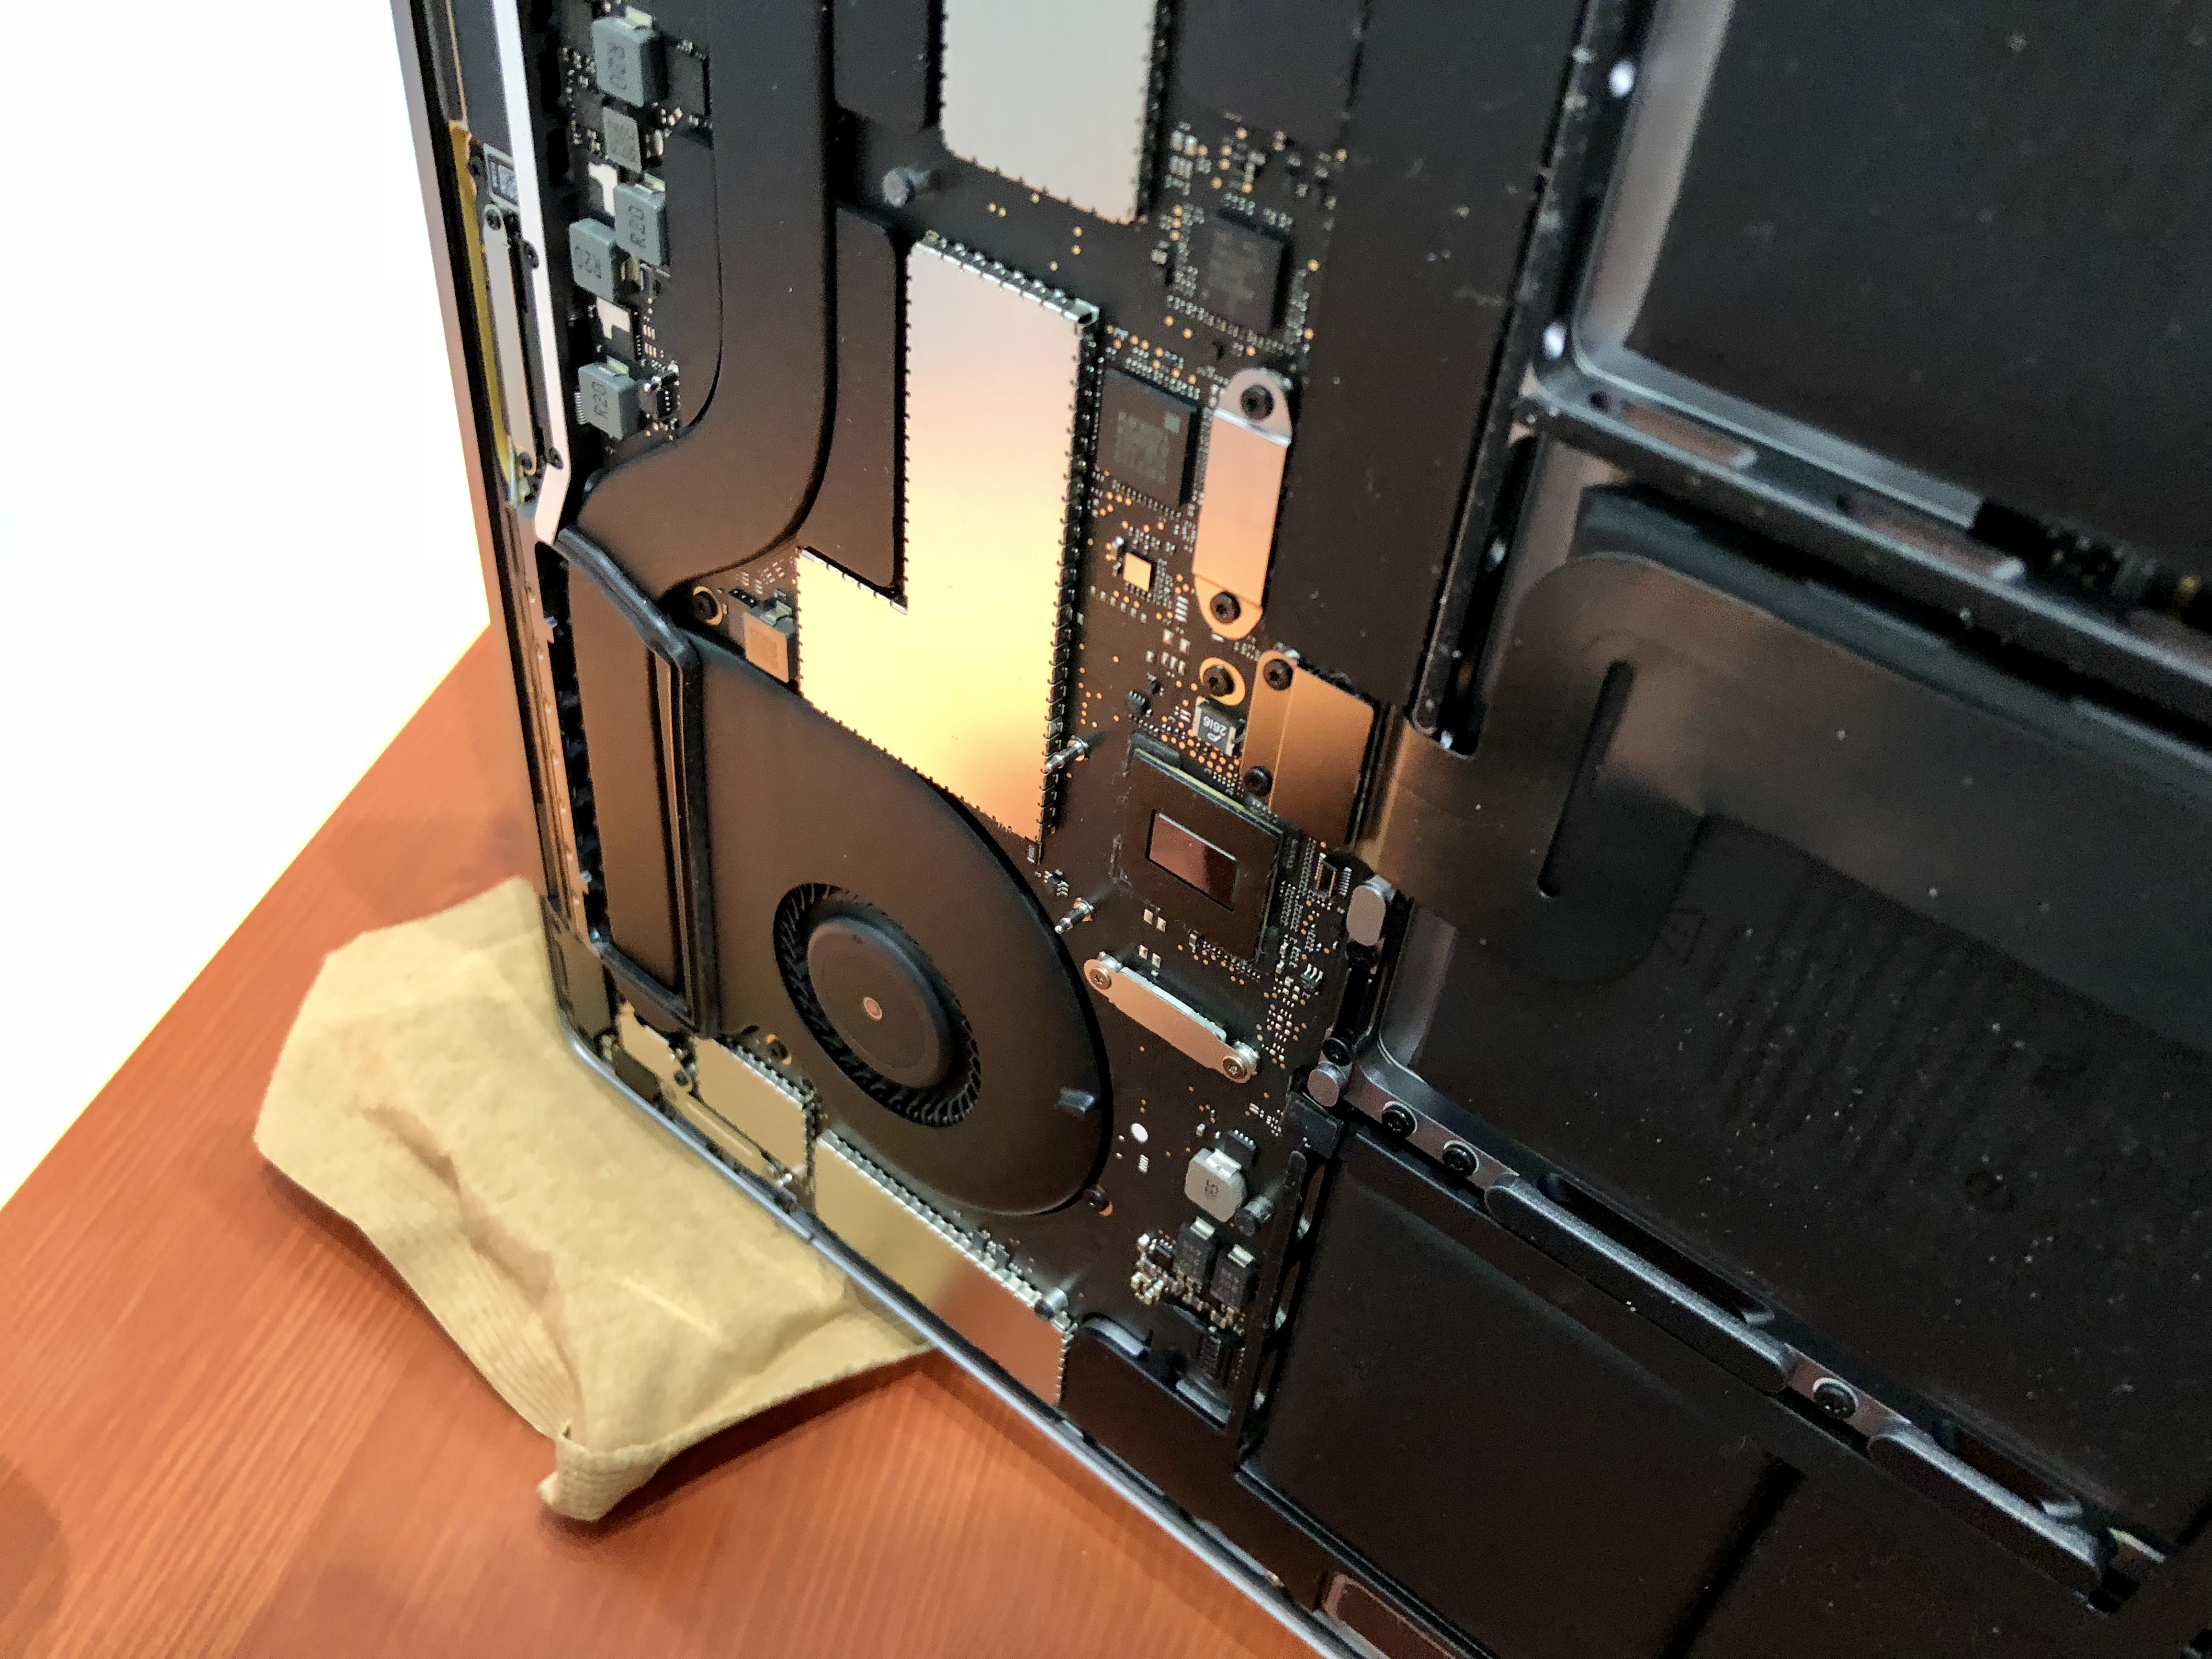 MacBook Water Damage: How to Save Your MacBook or MacBook Pro